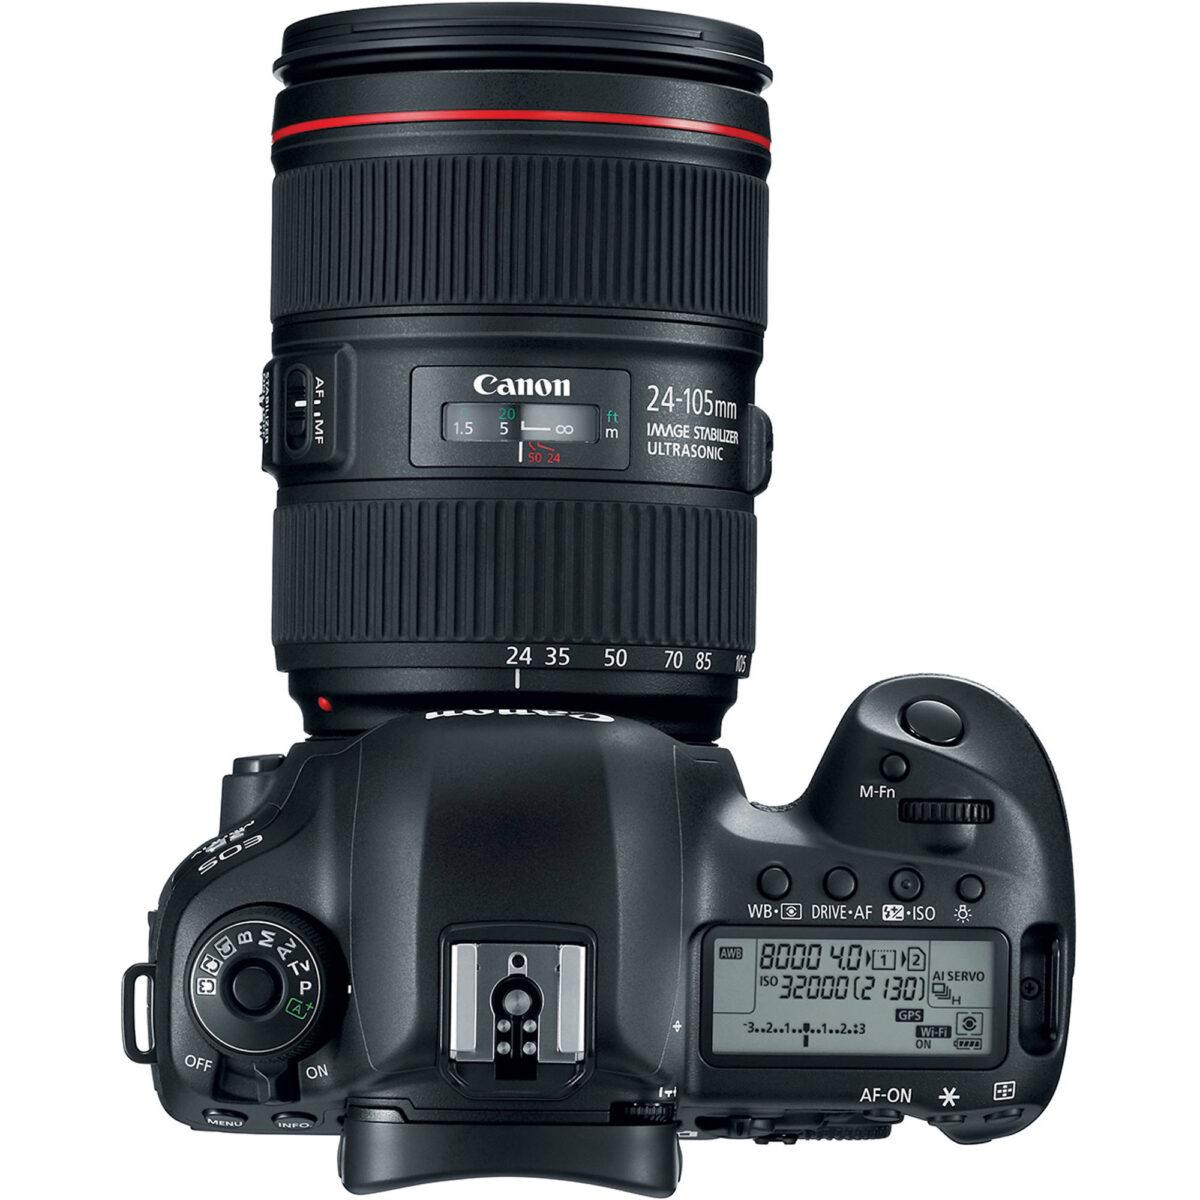 قیمت دوربین canon eos 5d mark IV تایپ 2 - یزد کمرا